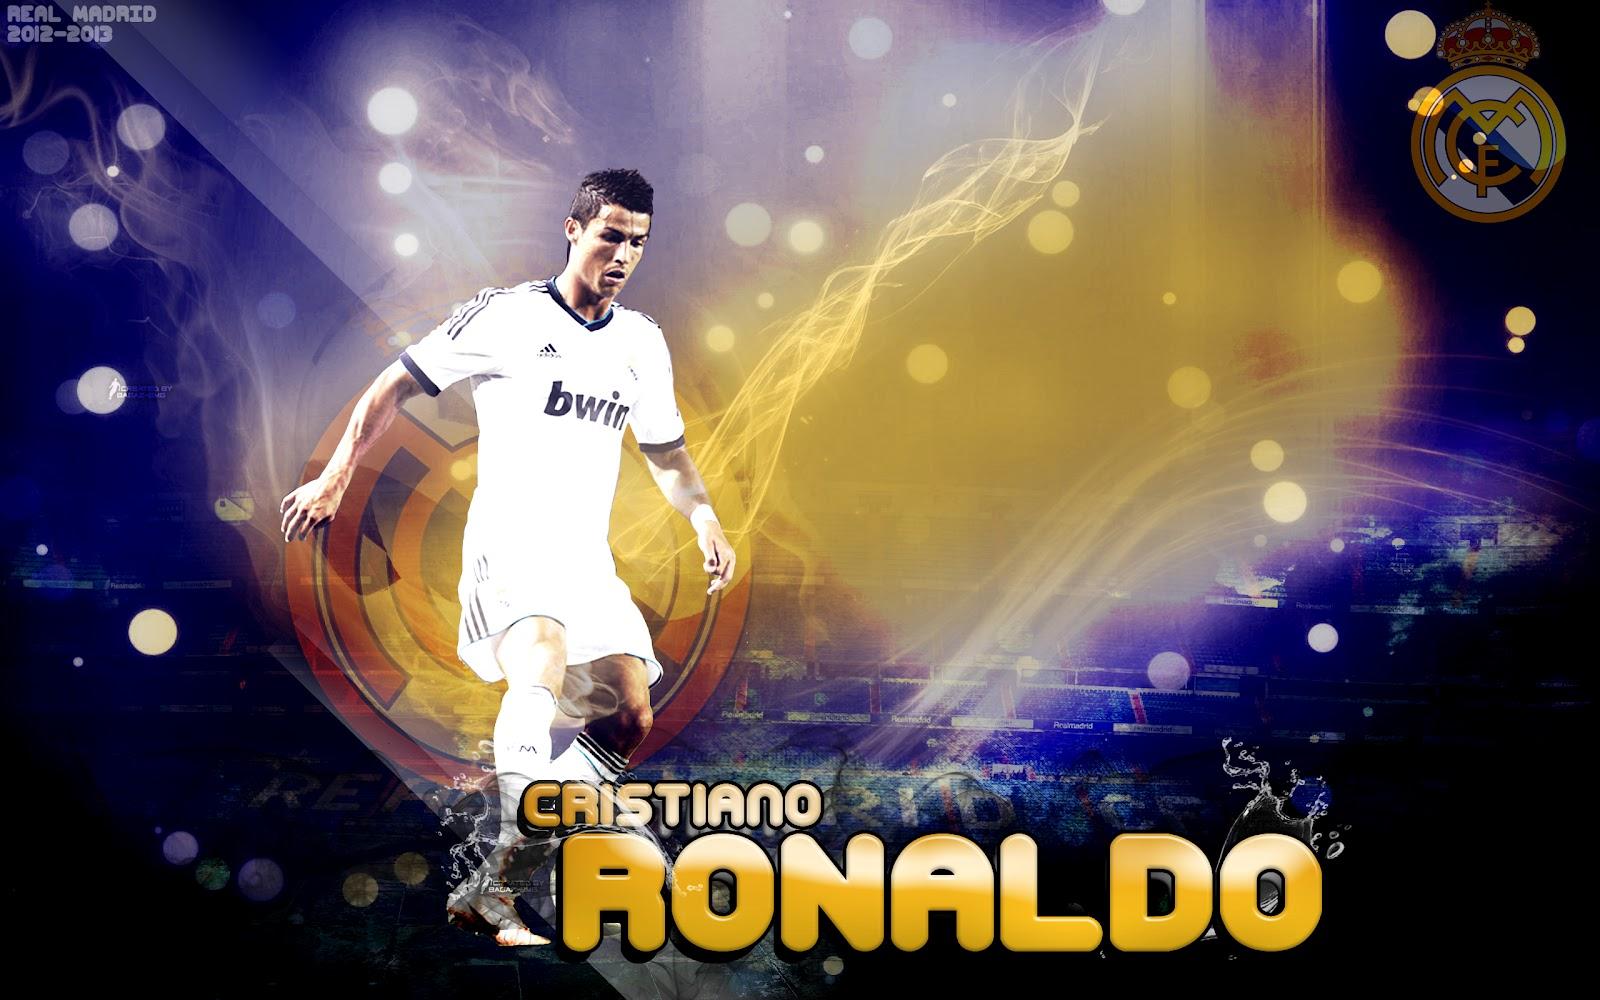 http://3.bp.blogspot.com/-CKjb9zigOUA/UOcXW64vBNI/AAAAAAAAEQE/a9LjeUMn218/s1600/Cristiano+Ronaldo+2013+Wallpapers.jpg